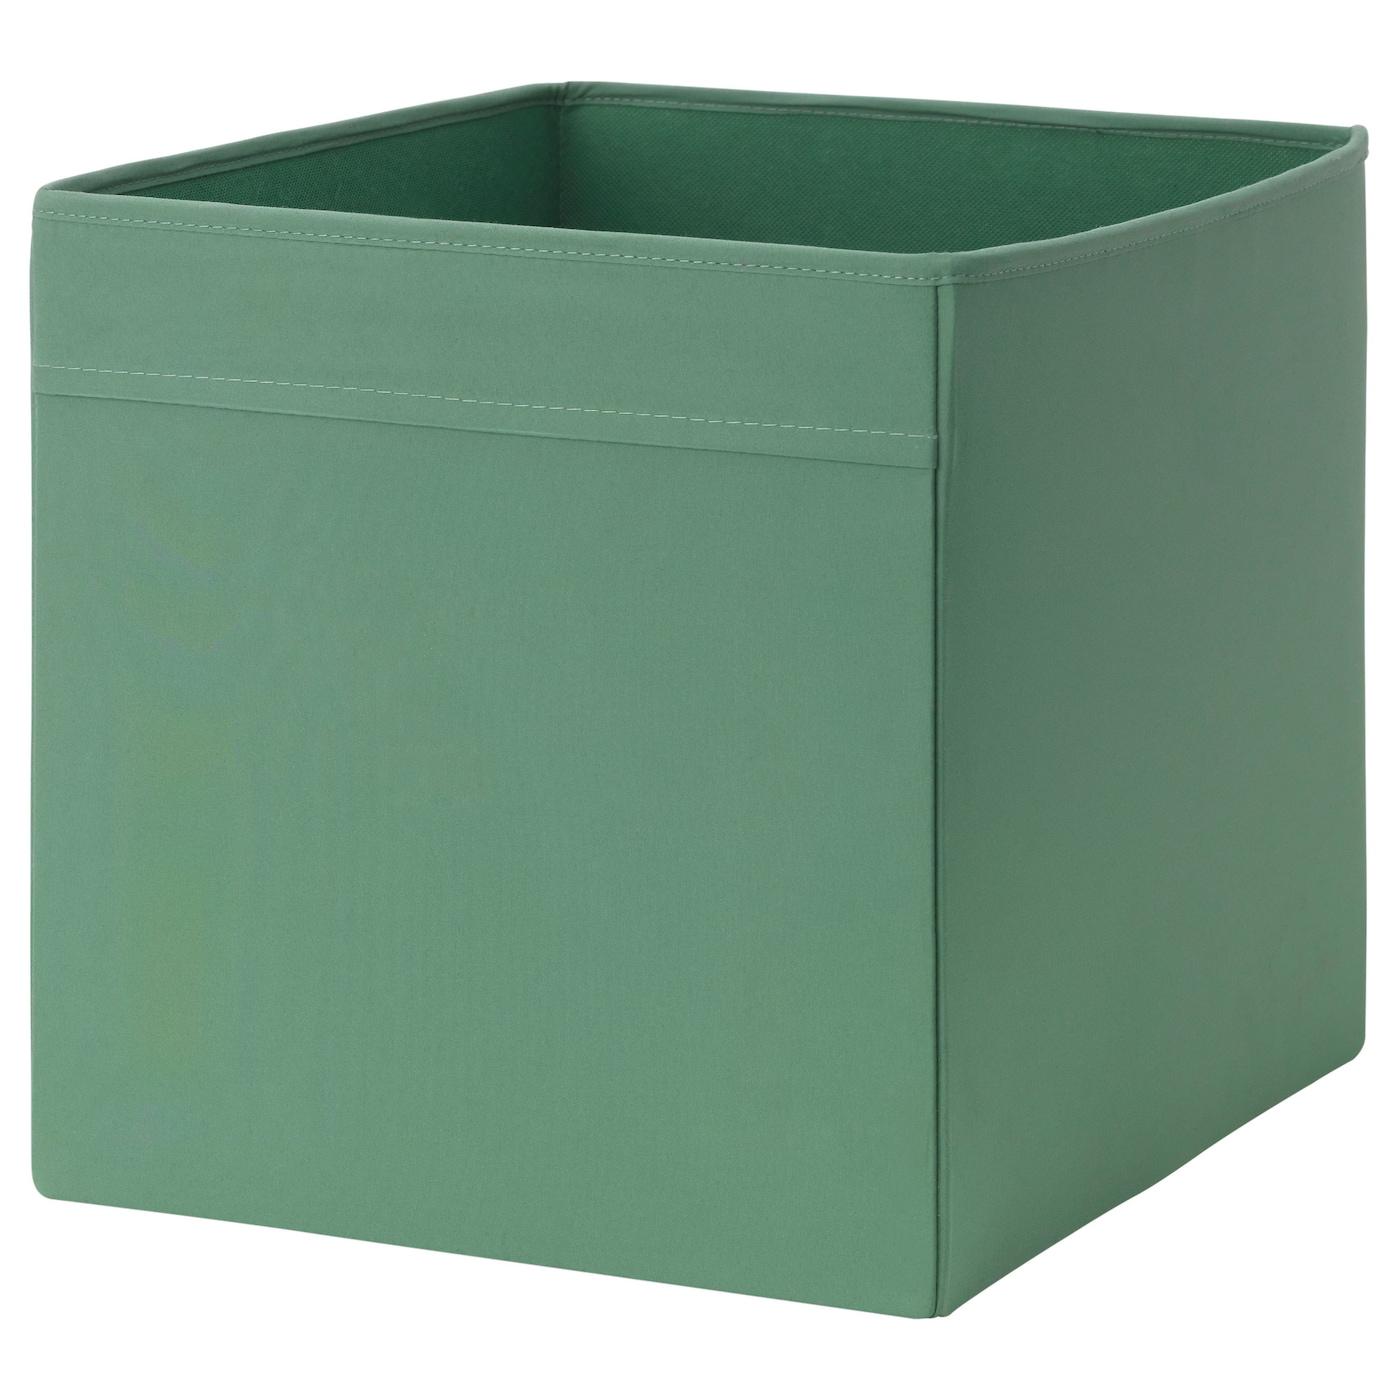 dr na rangement tissu vert fonc 33x38x33 cm ikea. Black Bedroom Furniture Sets. Home Design Ideas